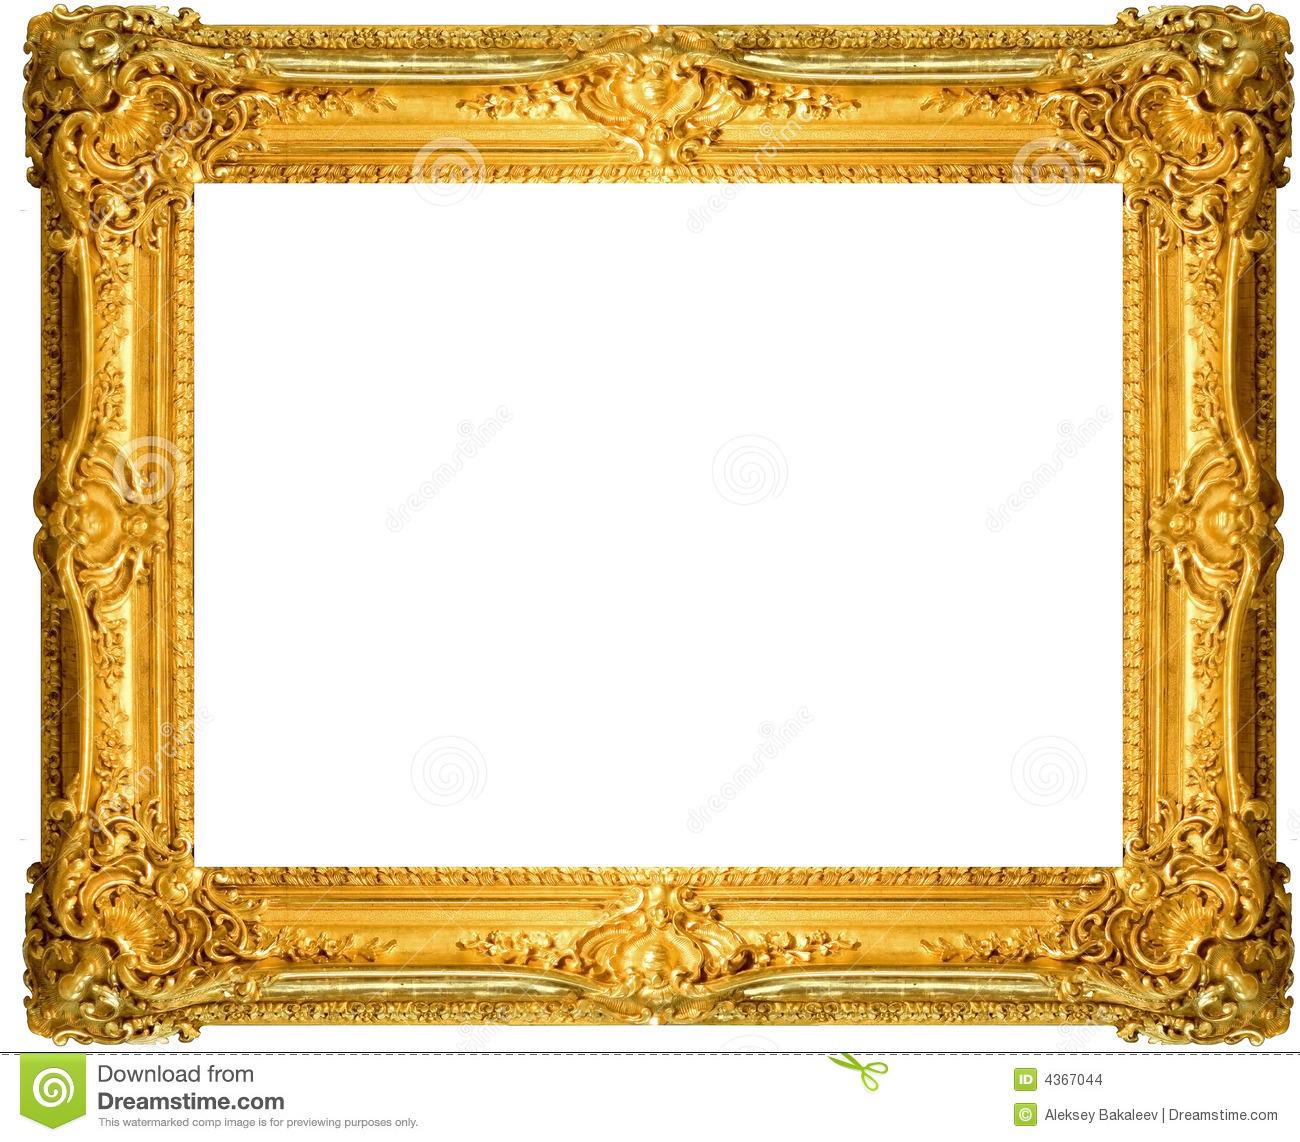 Gold block frames clipart banner black and white library Clipart images of gold frames - ClipartFest banner black and white library